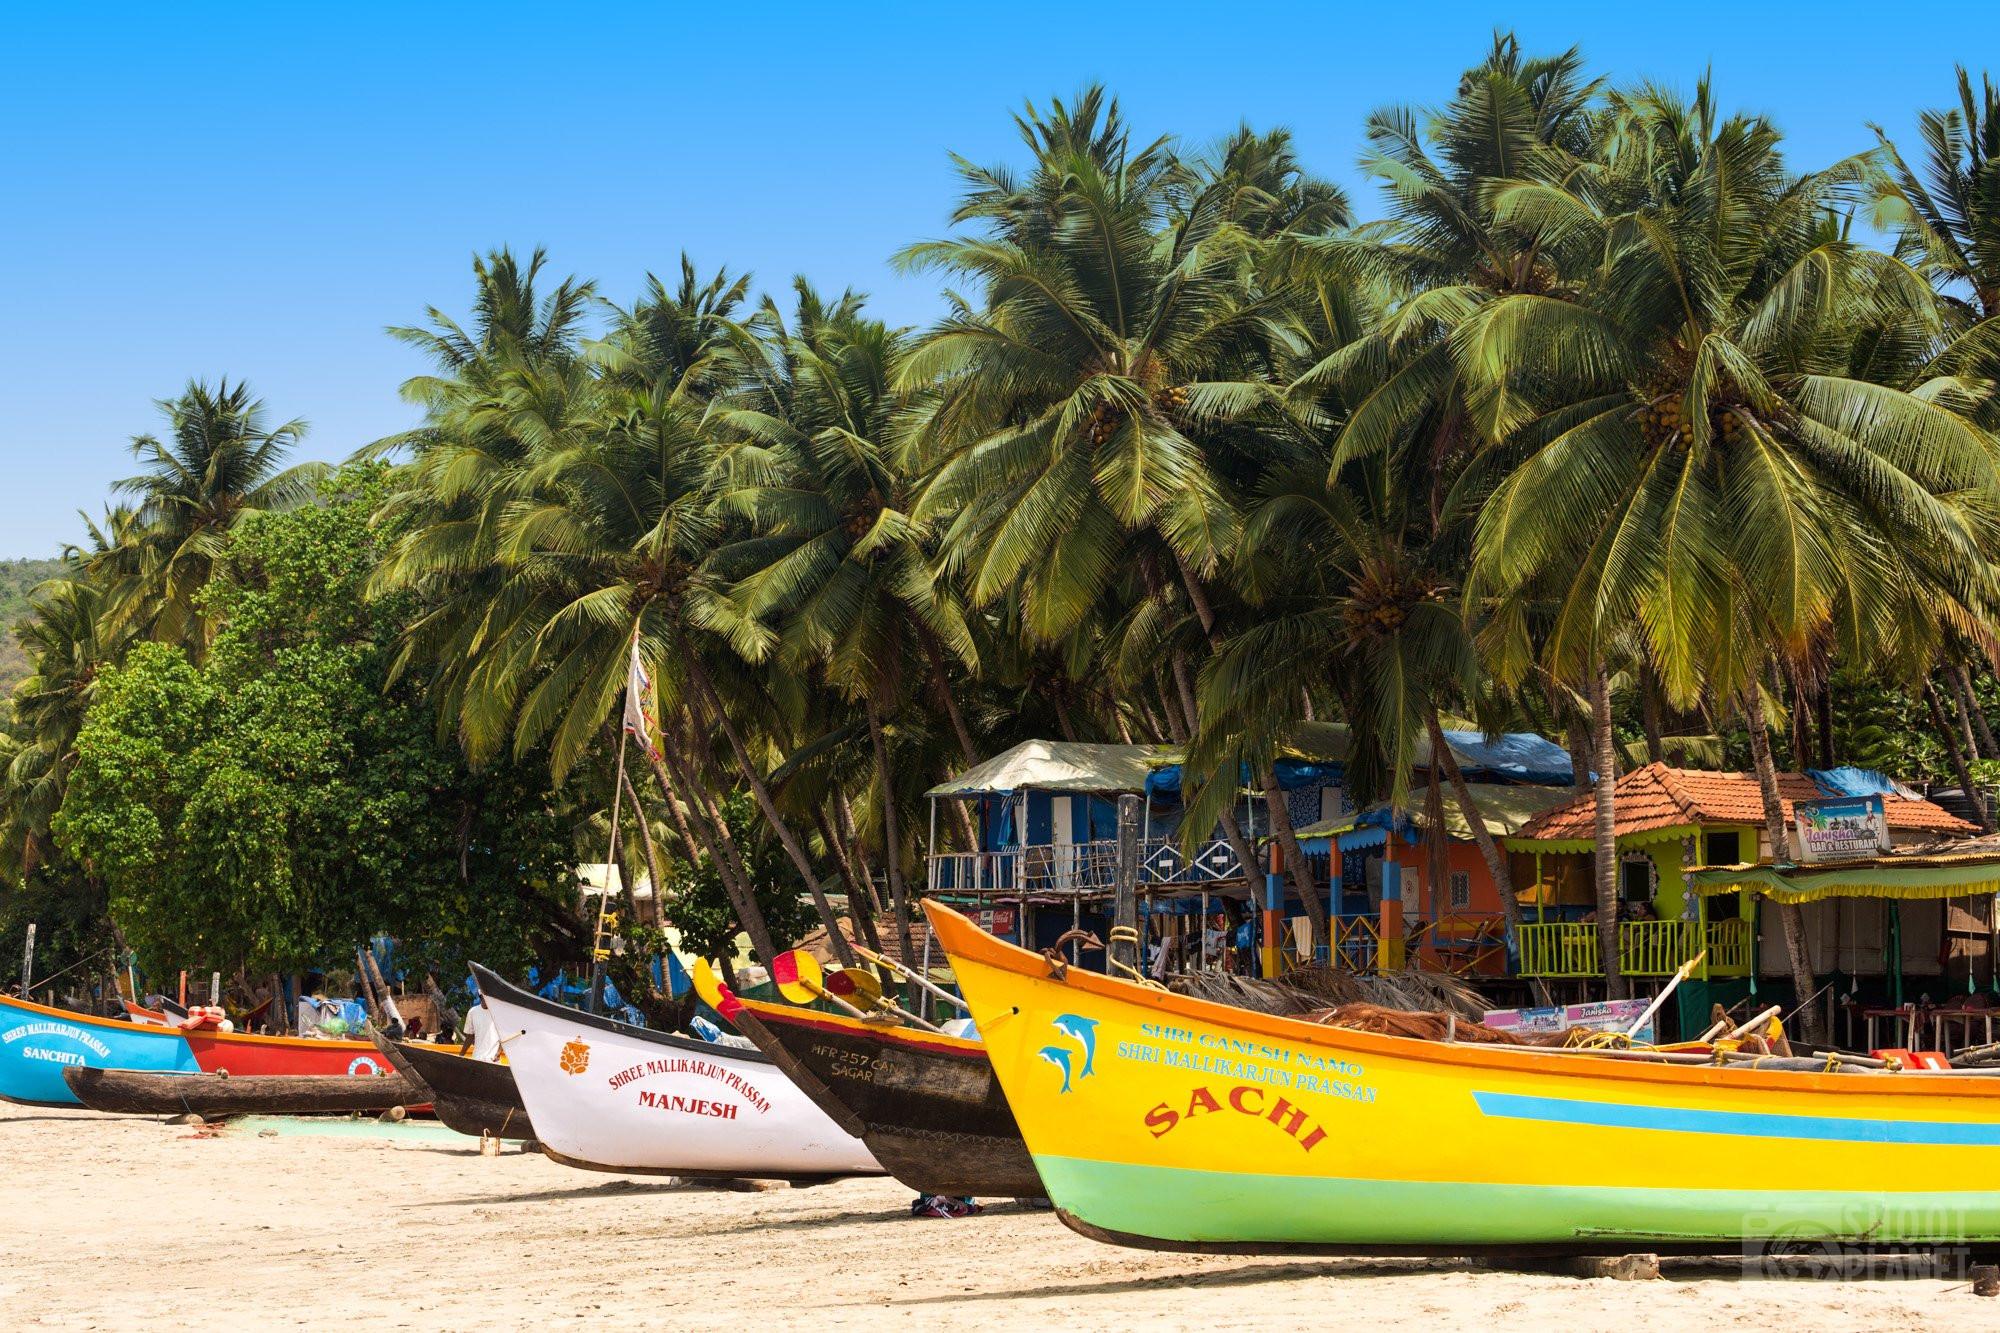 Palolem beach colorful boats, Goa India